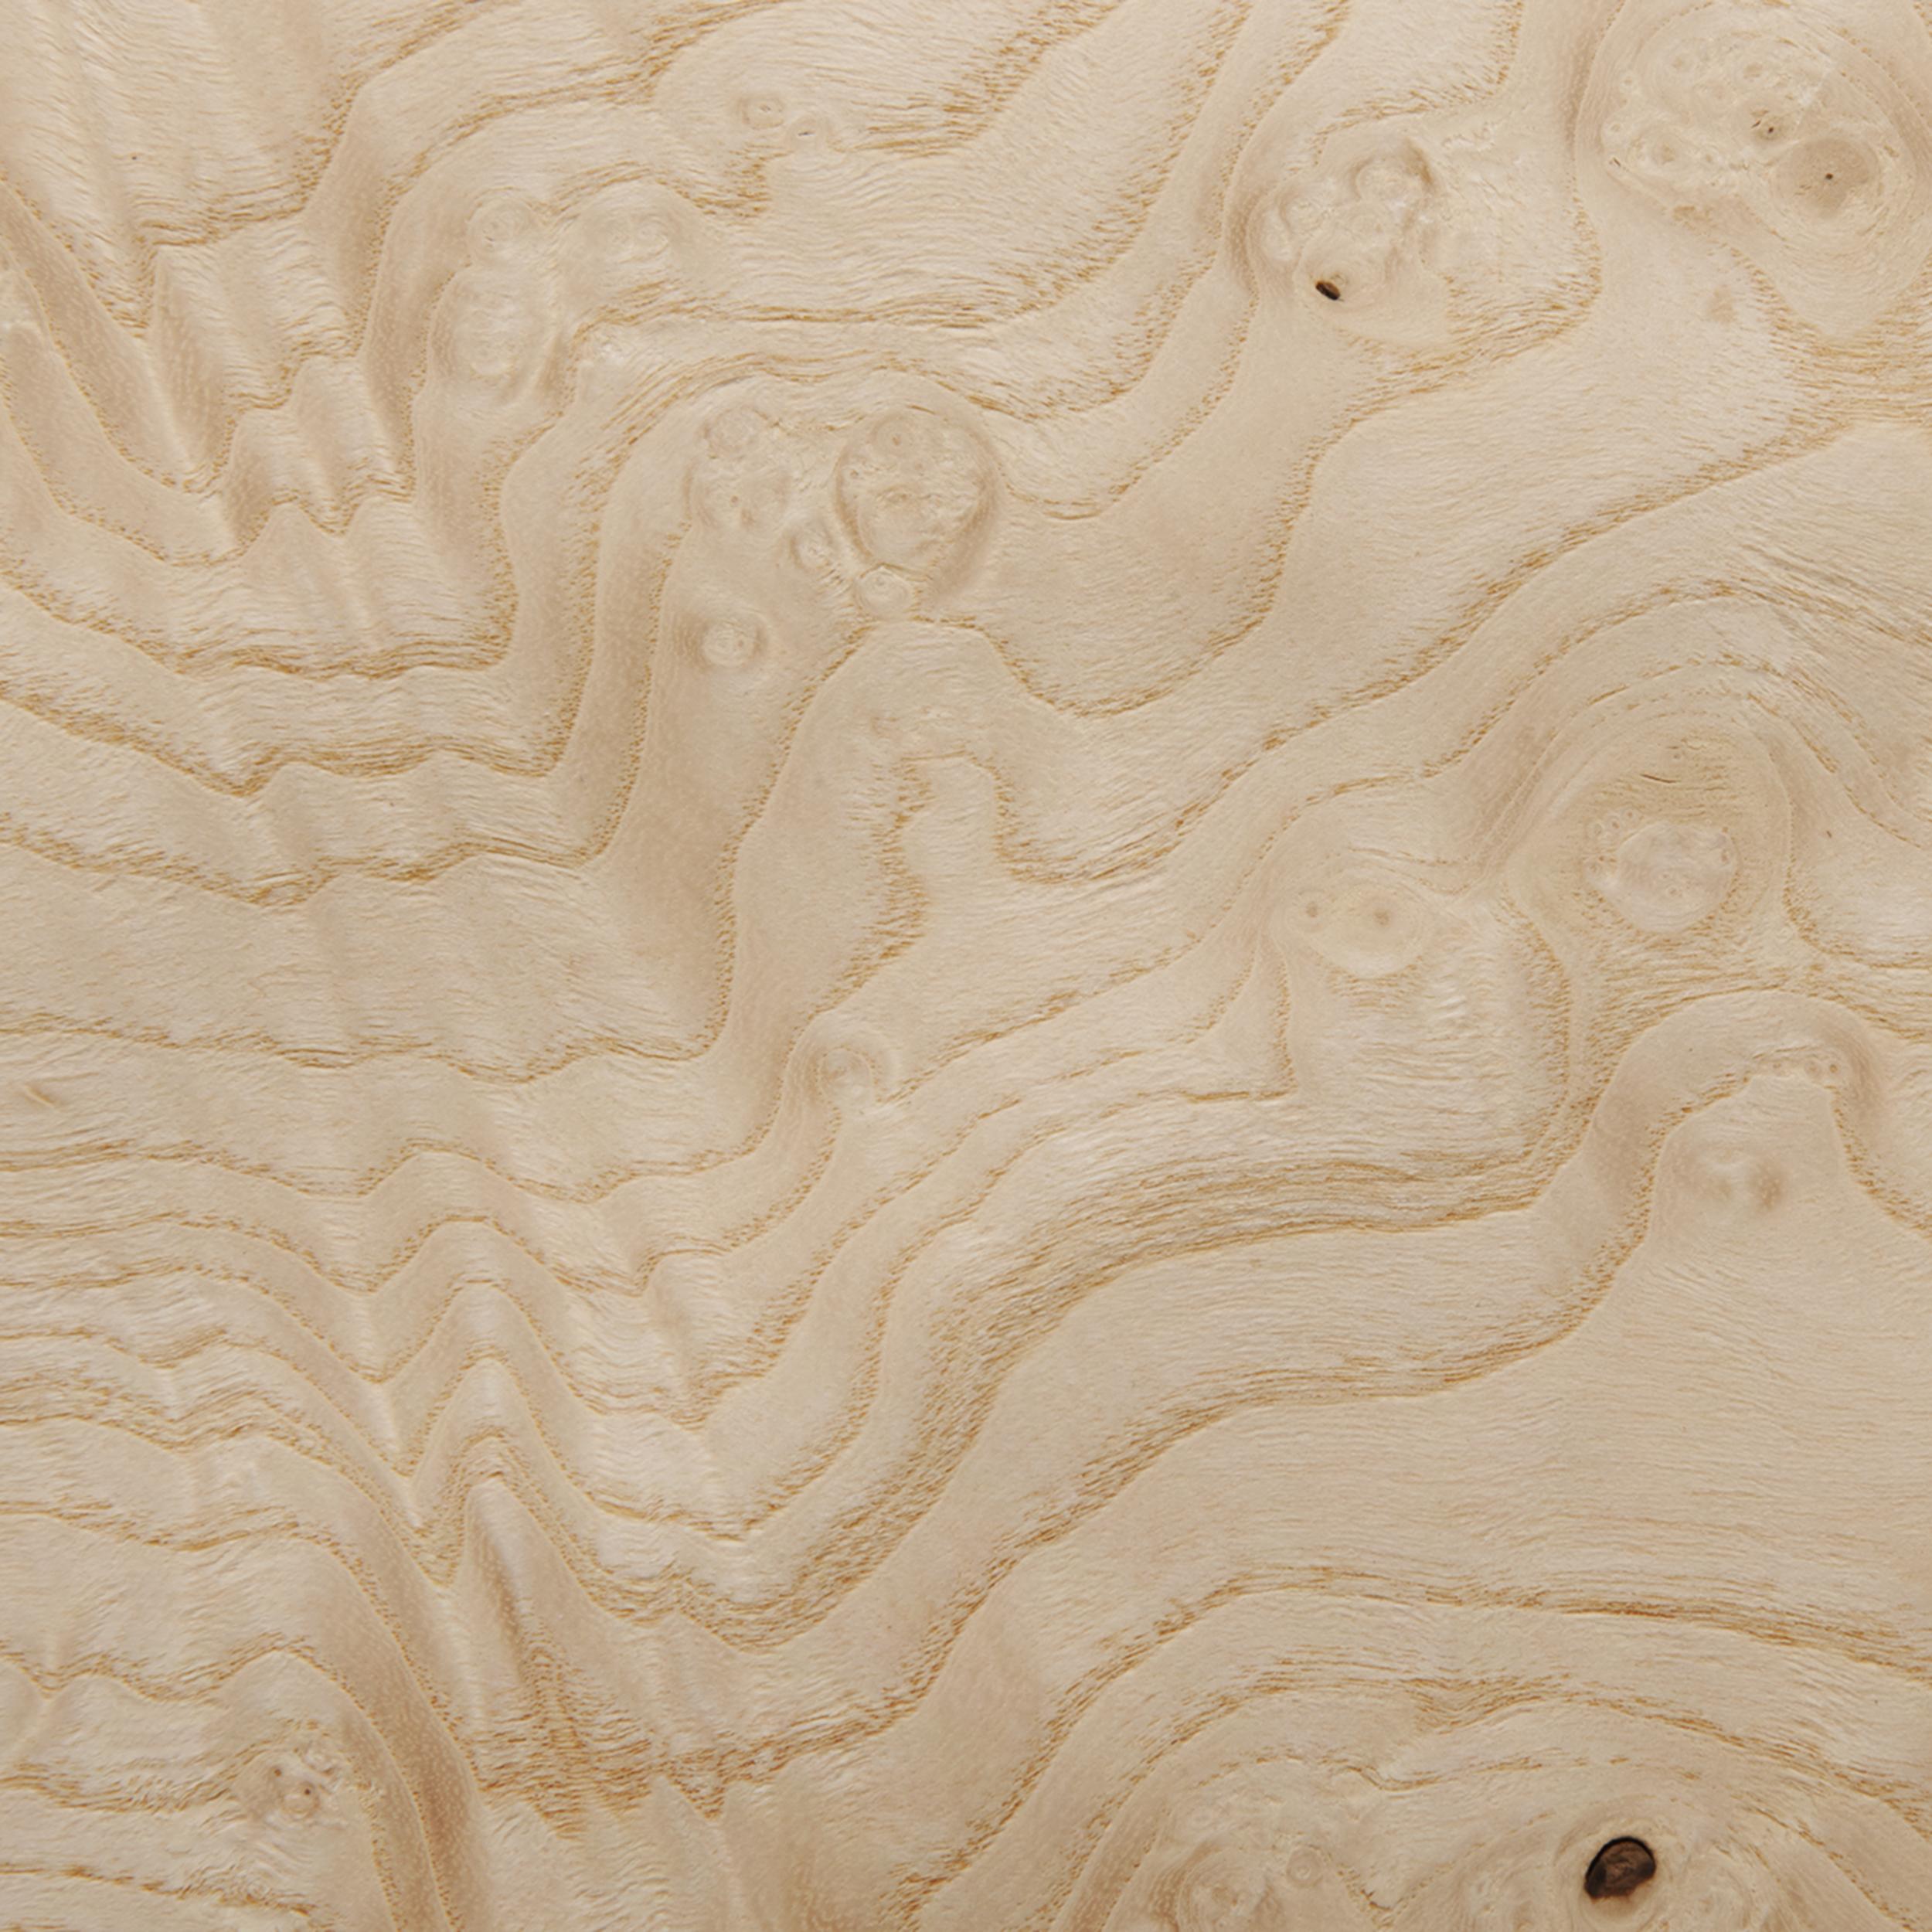 White Ash Burl Veneer Sheet 4' x 8' 2-Ply Wood on Wood